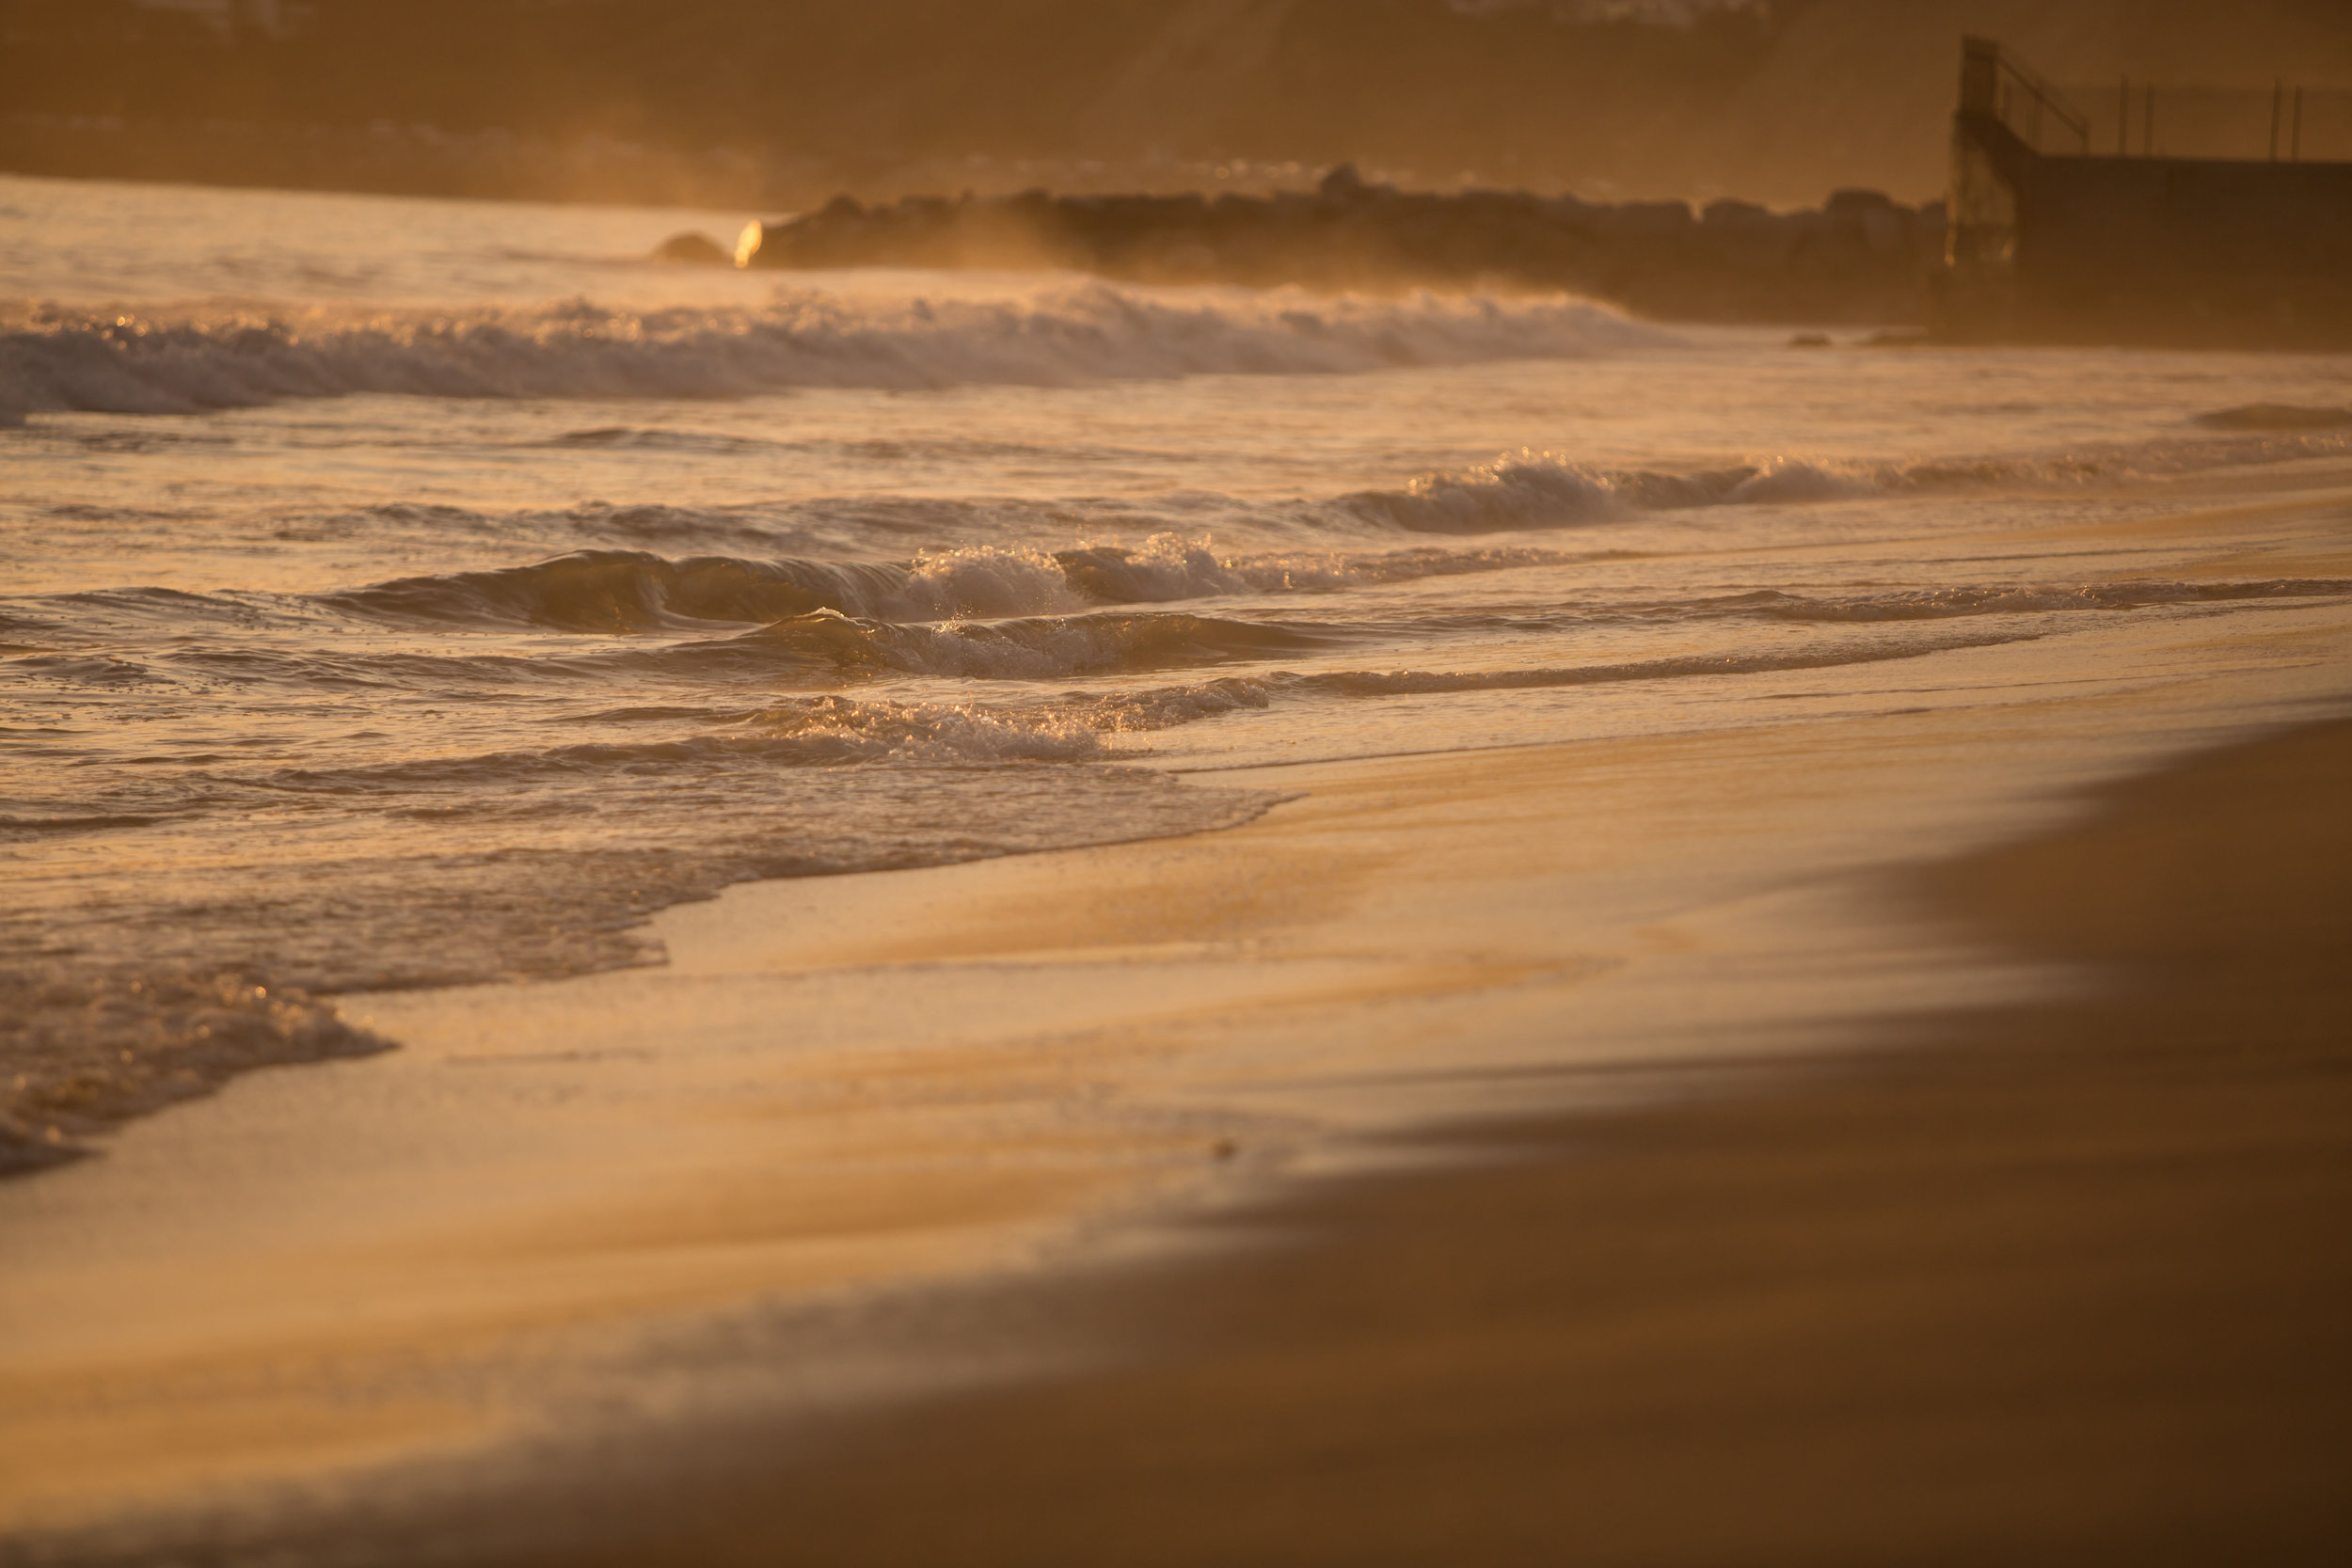 Marble_Falls_Horseshoe_Bay_Photographer_Beach_Family_Gandersons_12.jpg